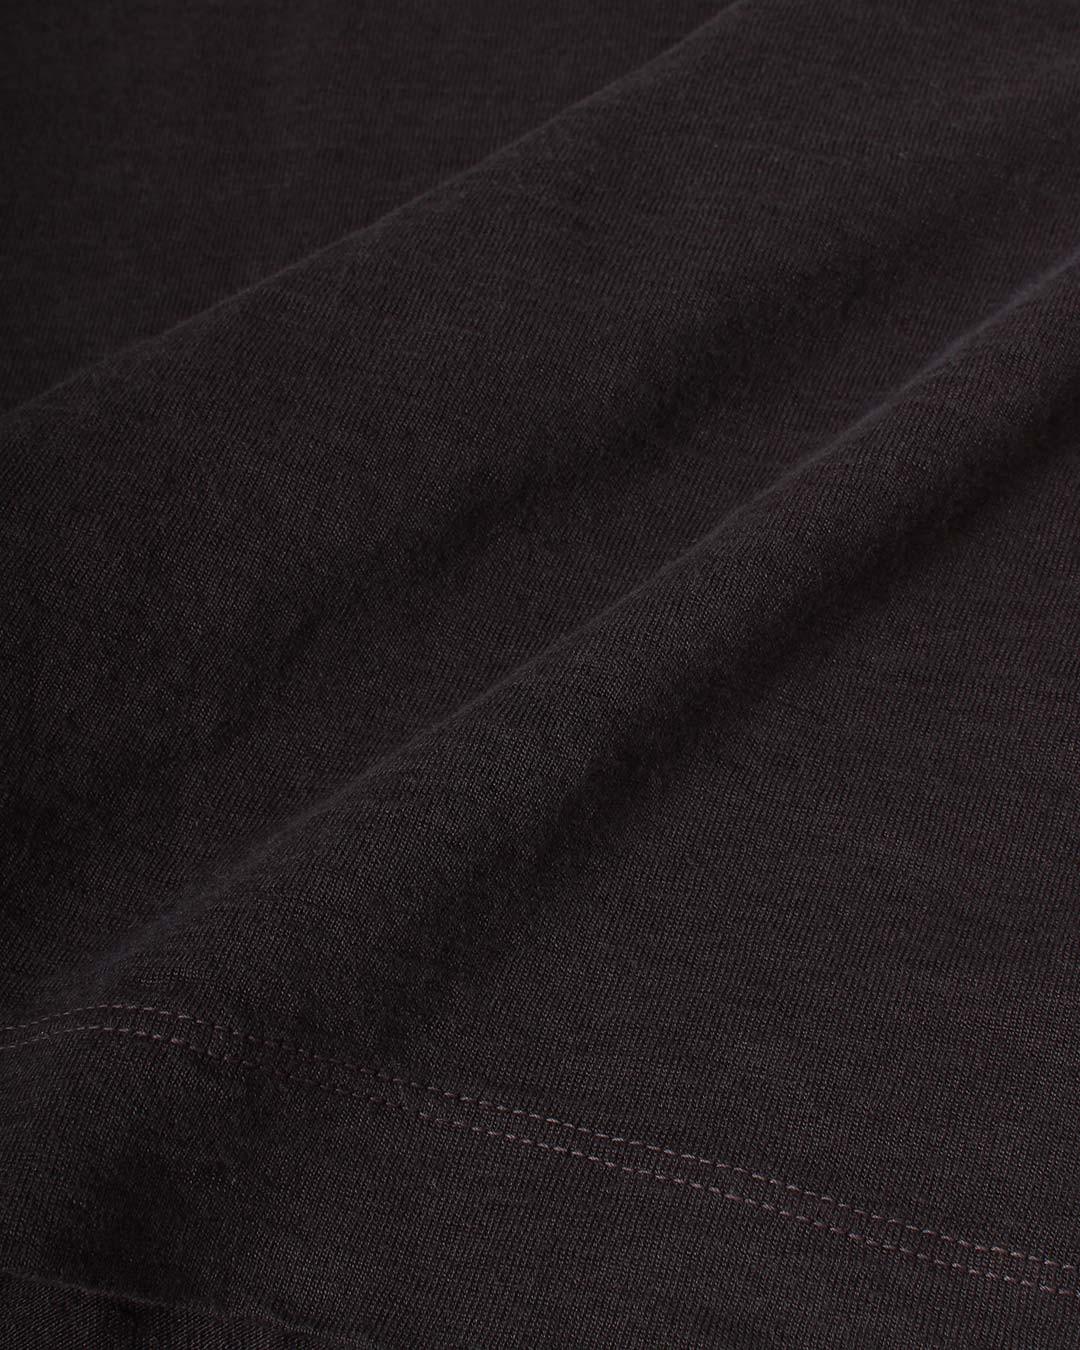 85 - Brown Linen